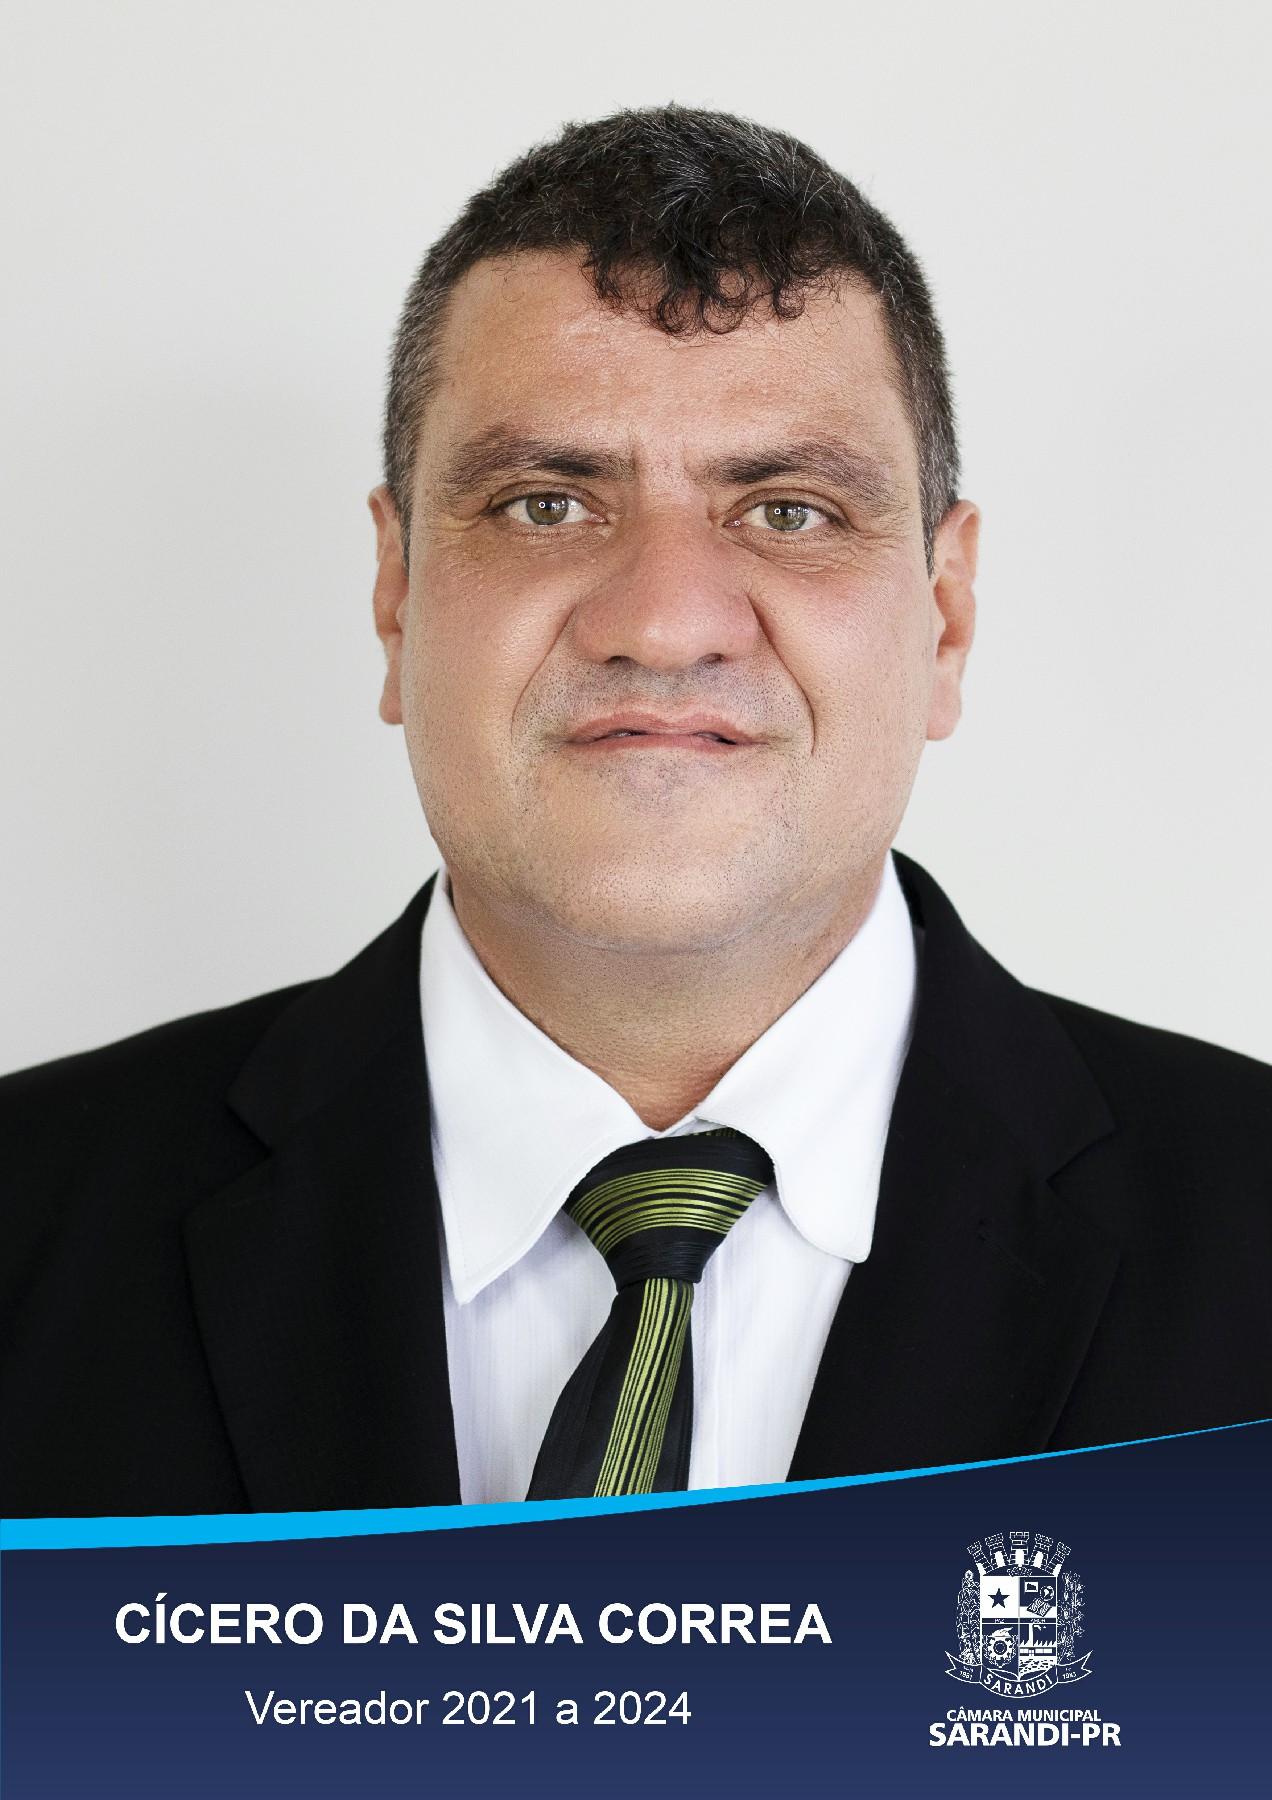 Cícero da Silva Correa - Cícero da Saúde